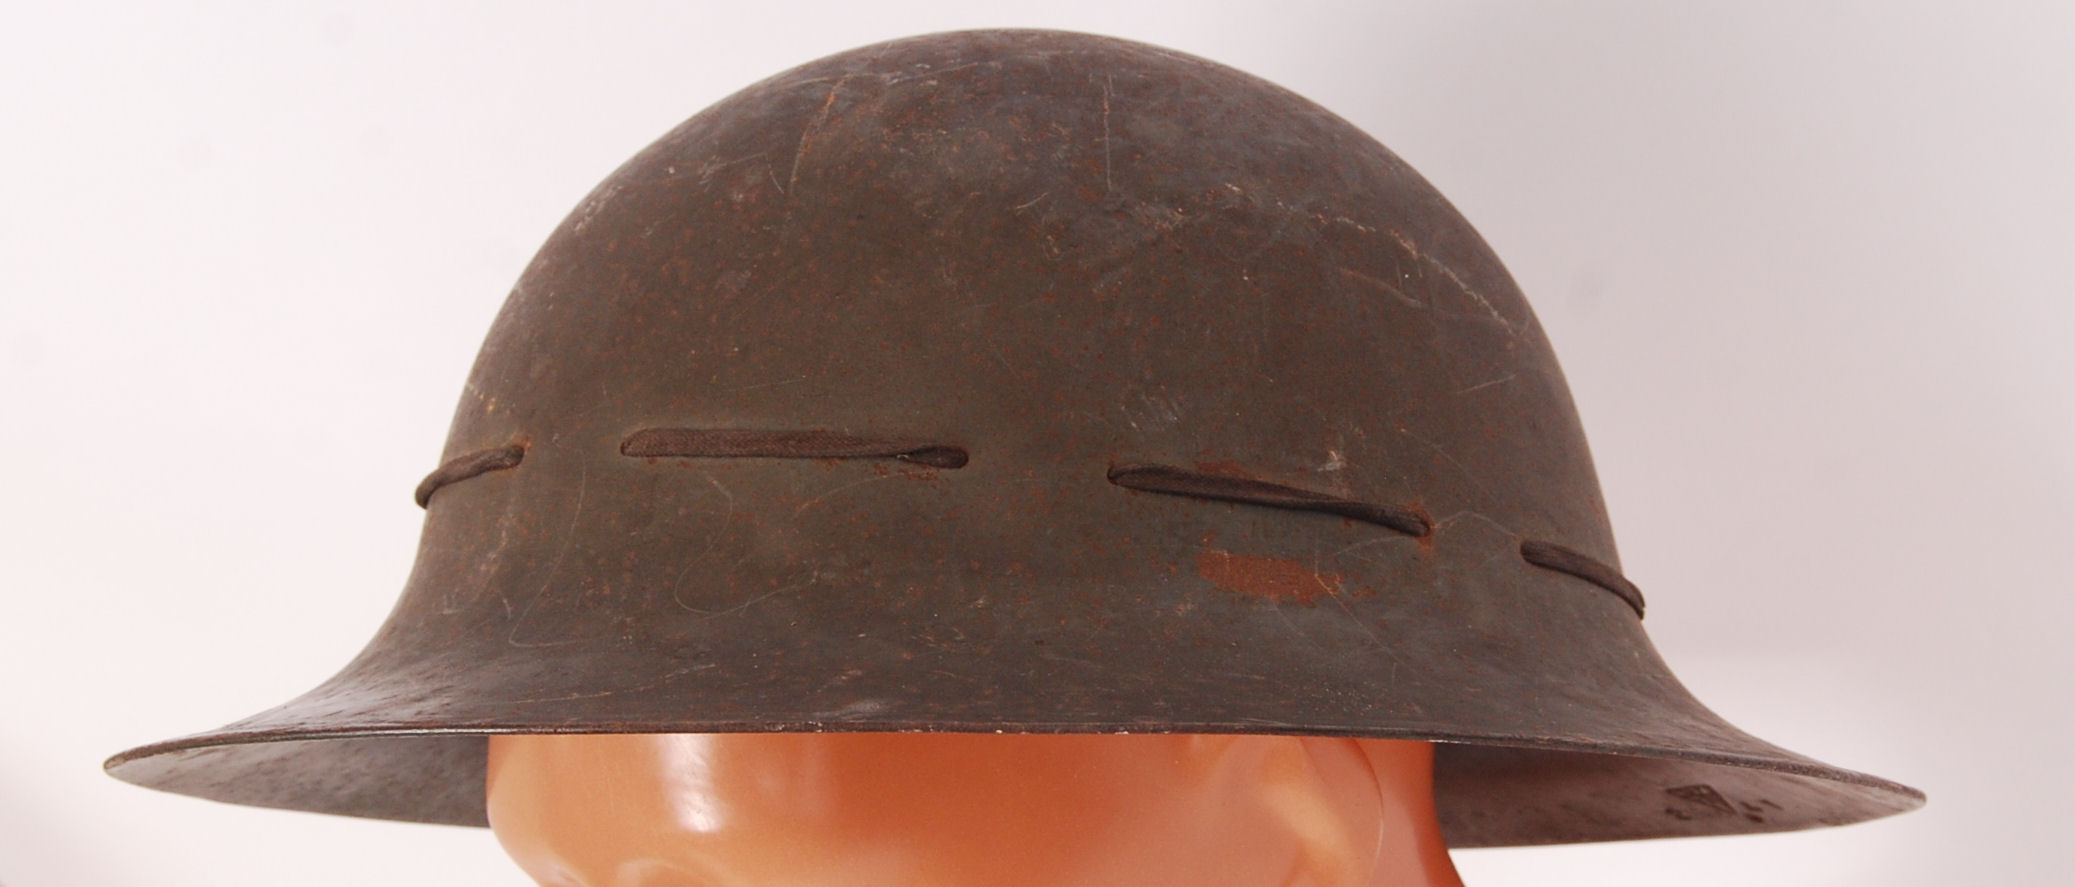 Lot 195 - WWII HELMET